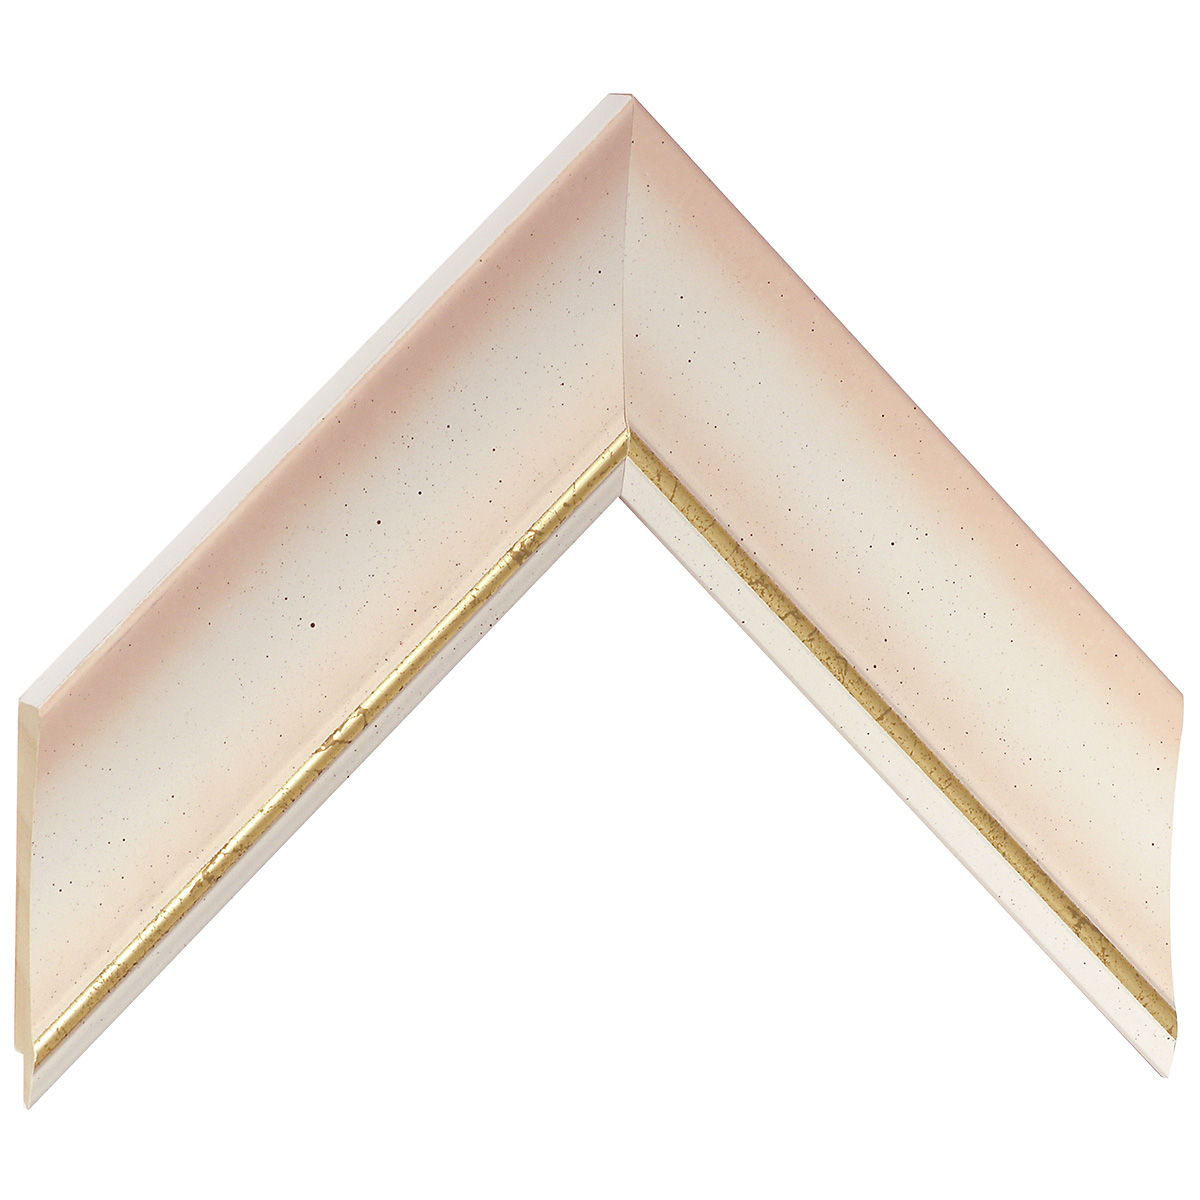 Liner ayous 50mm - convex shape, cream coloured, gold edge